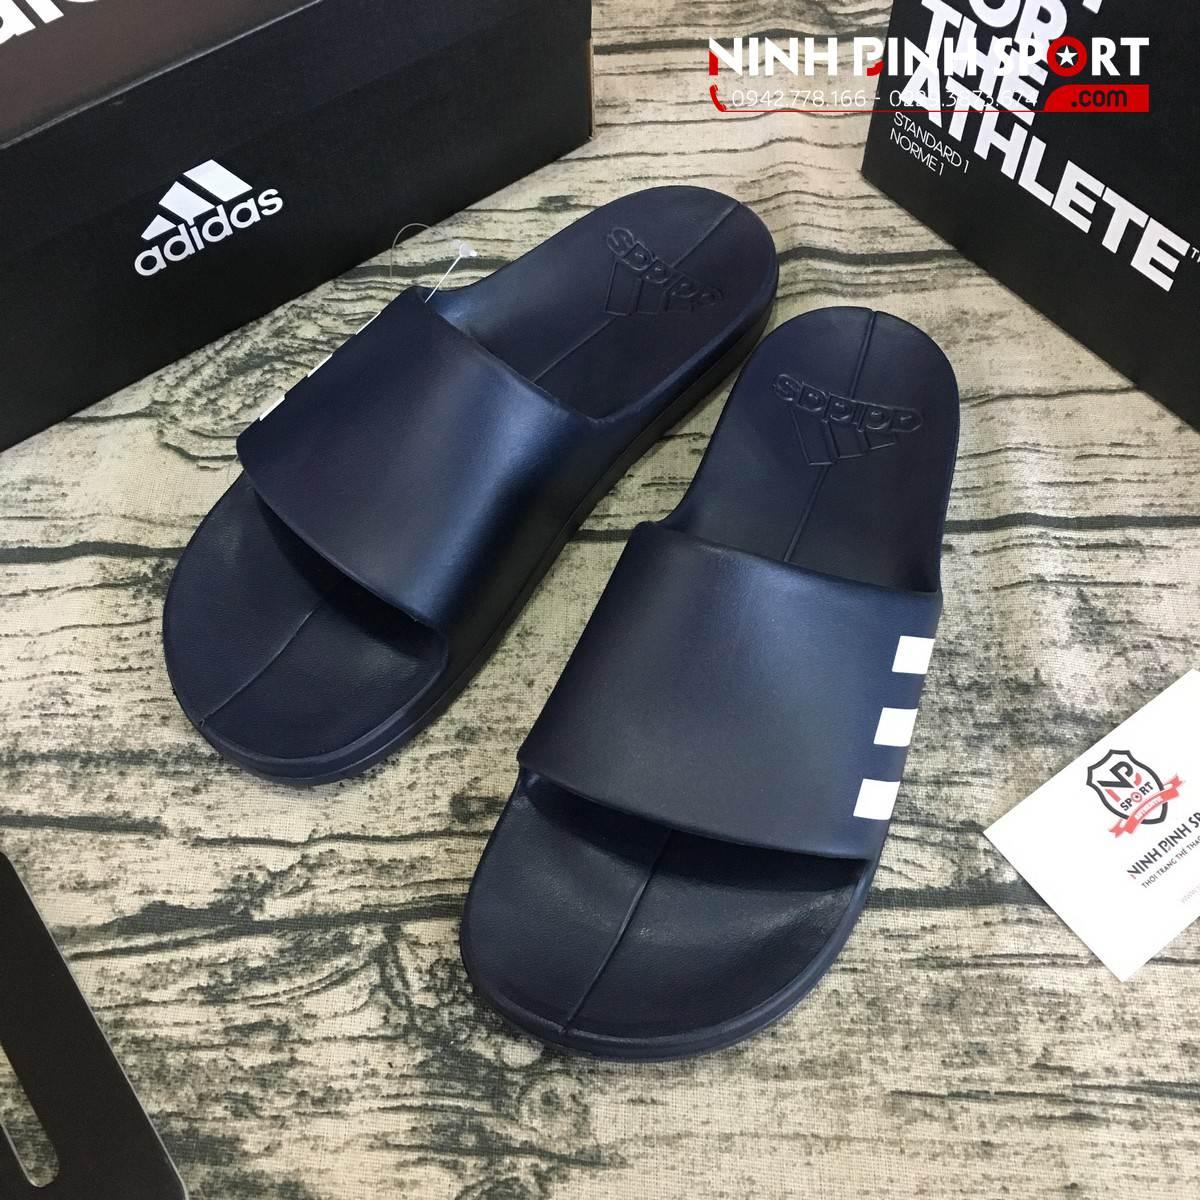 Dép thể thao nam Adidas Aqualette Slides CG3537